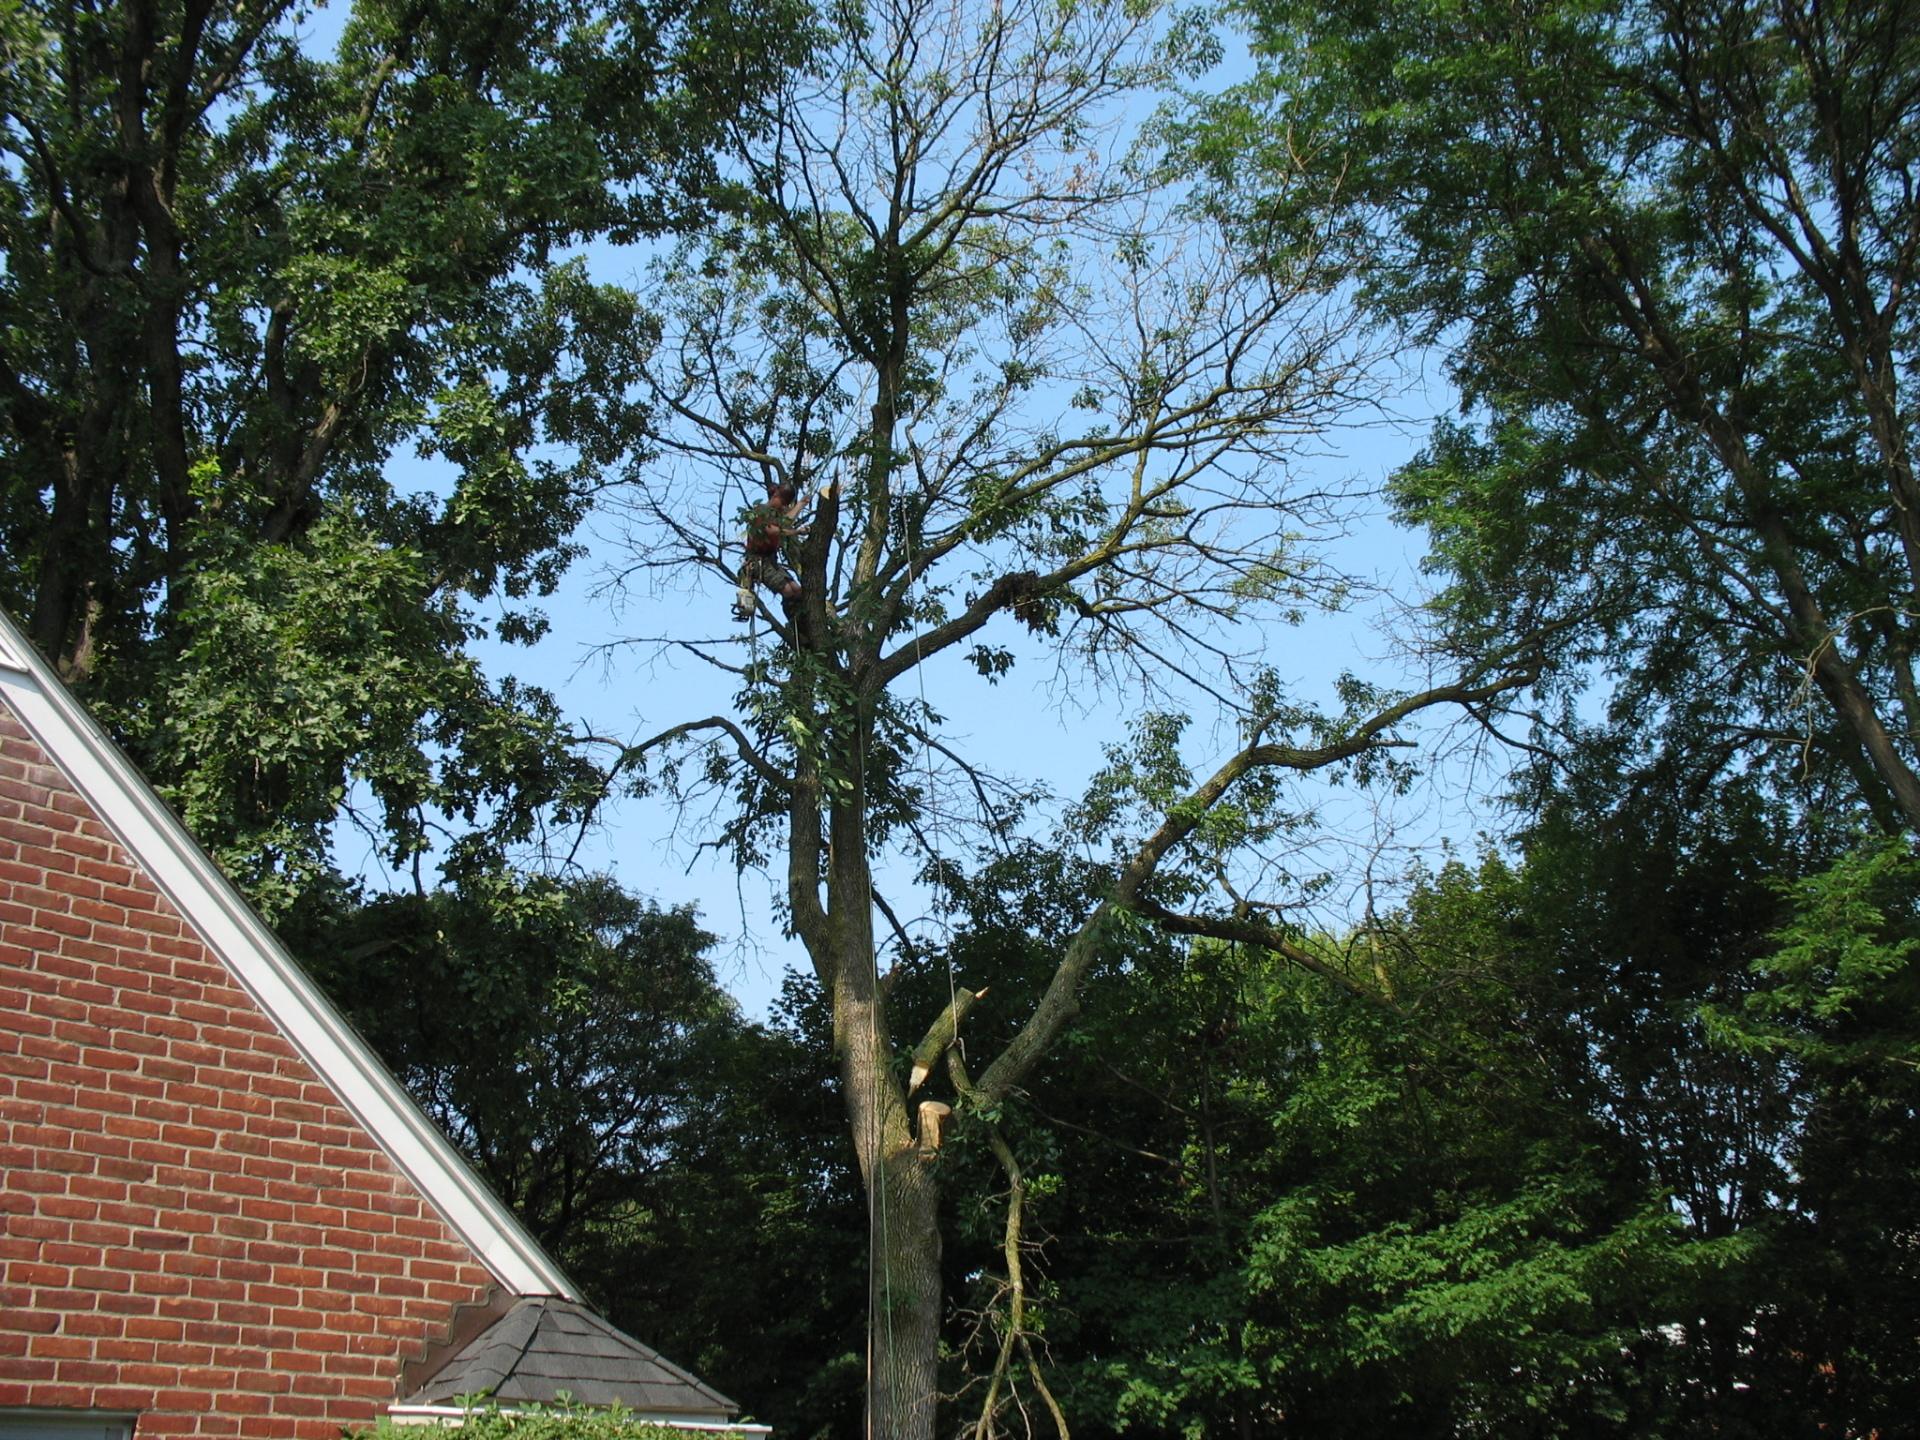 MAJOR TREE TRIMMING